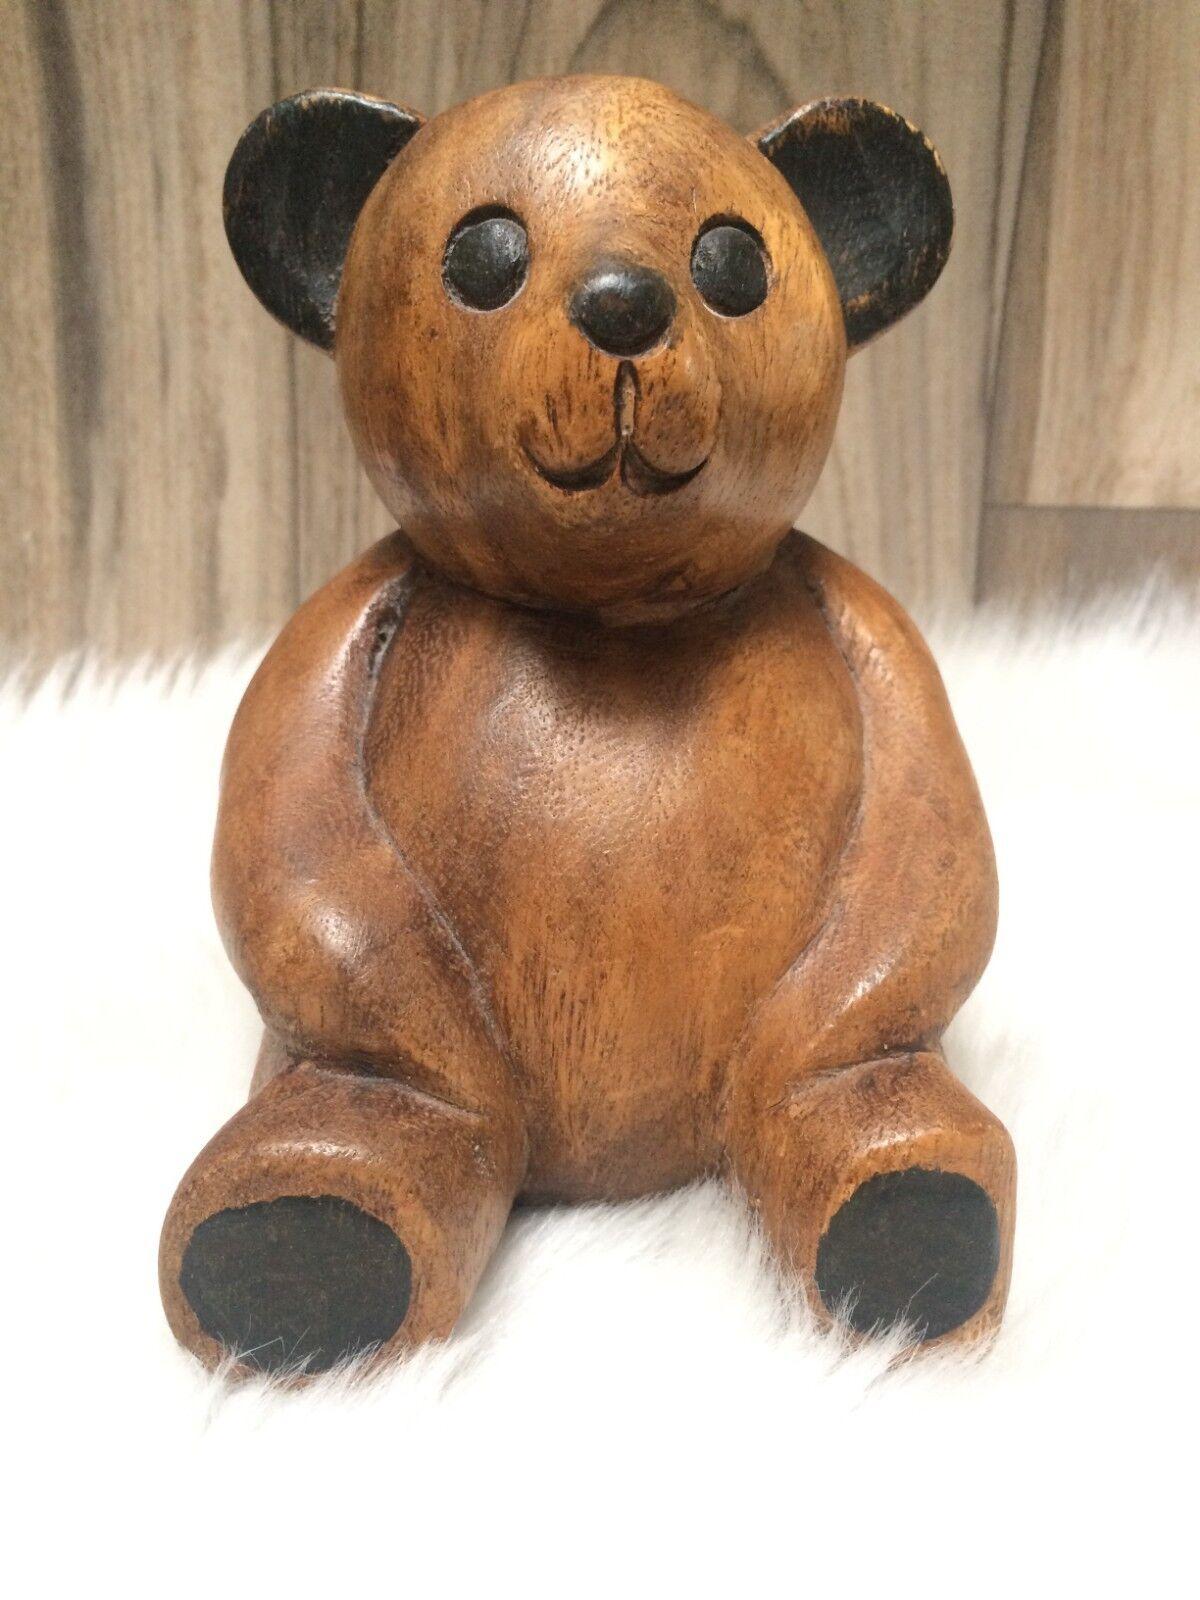 Top Zustand Fashionable Patterns Dolls & Bears The Cheapest Price Annette Himstedt Puppe Tara 70 Cm Art Dolls-ooak